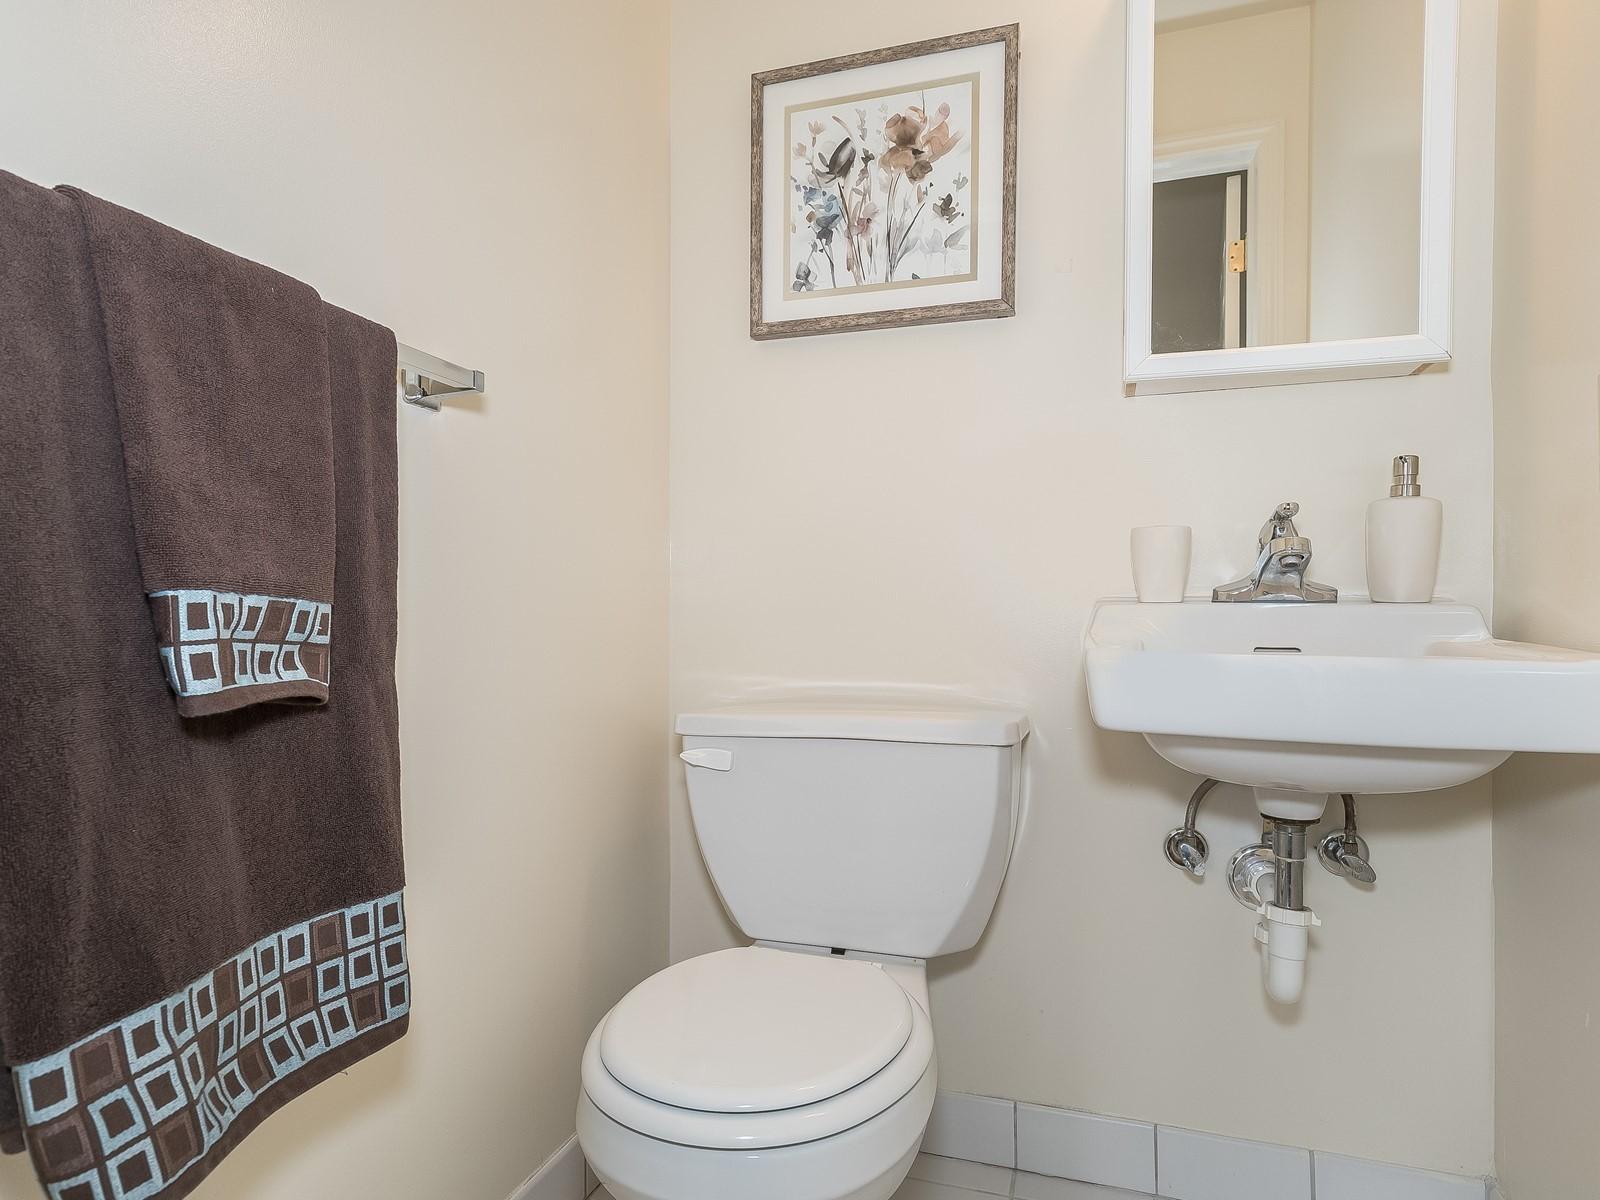 08-Bridgewater FurnishedApartment_22_Master Bathroom